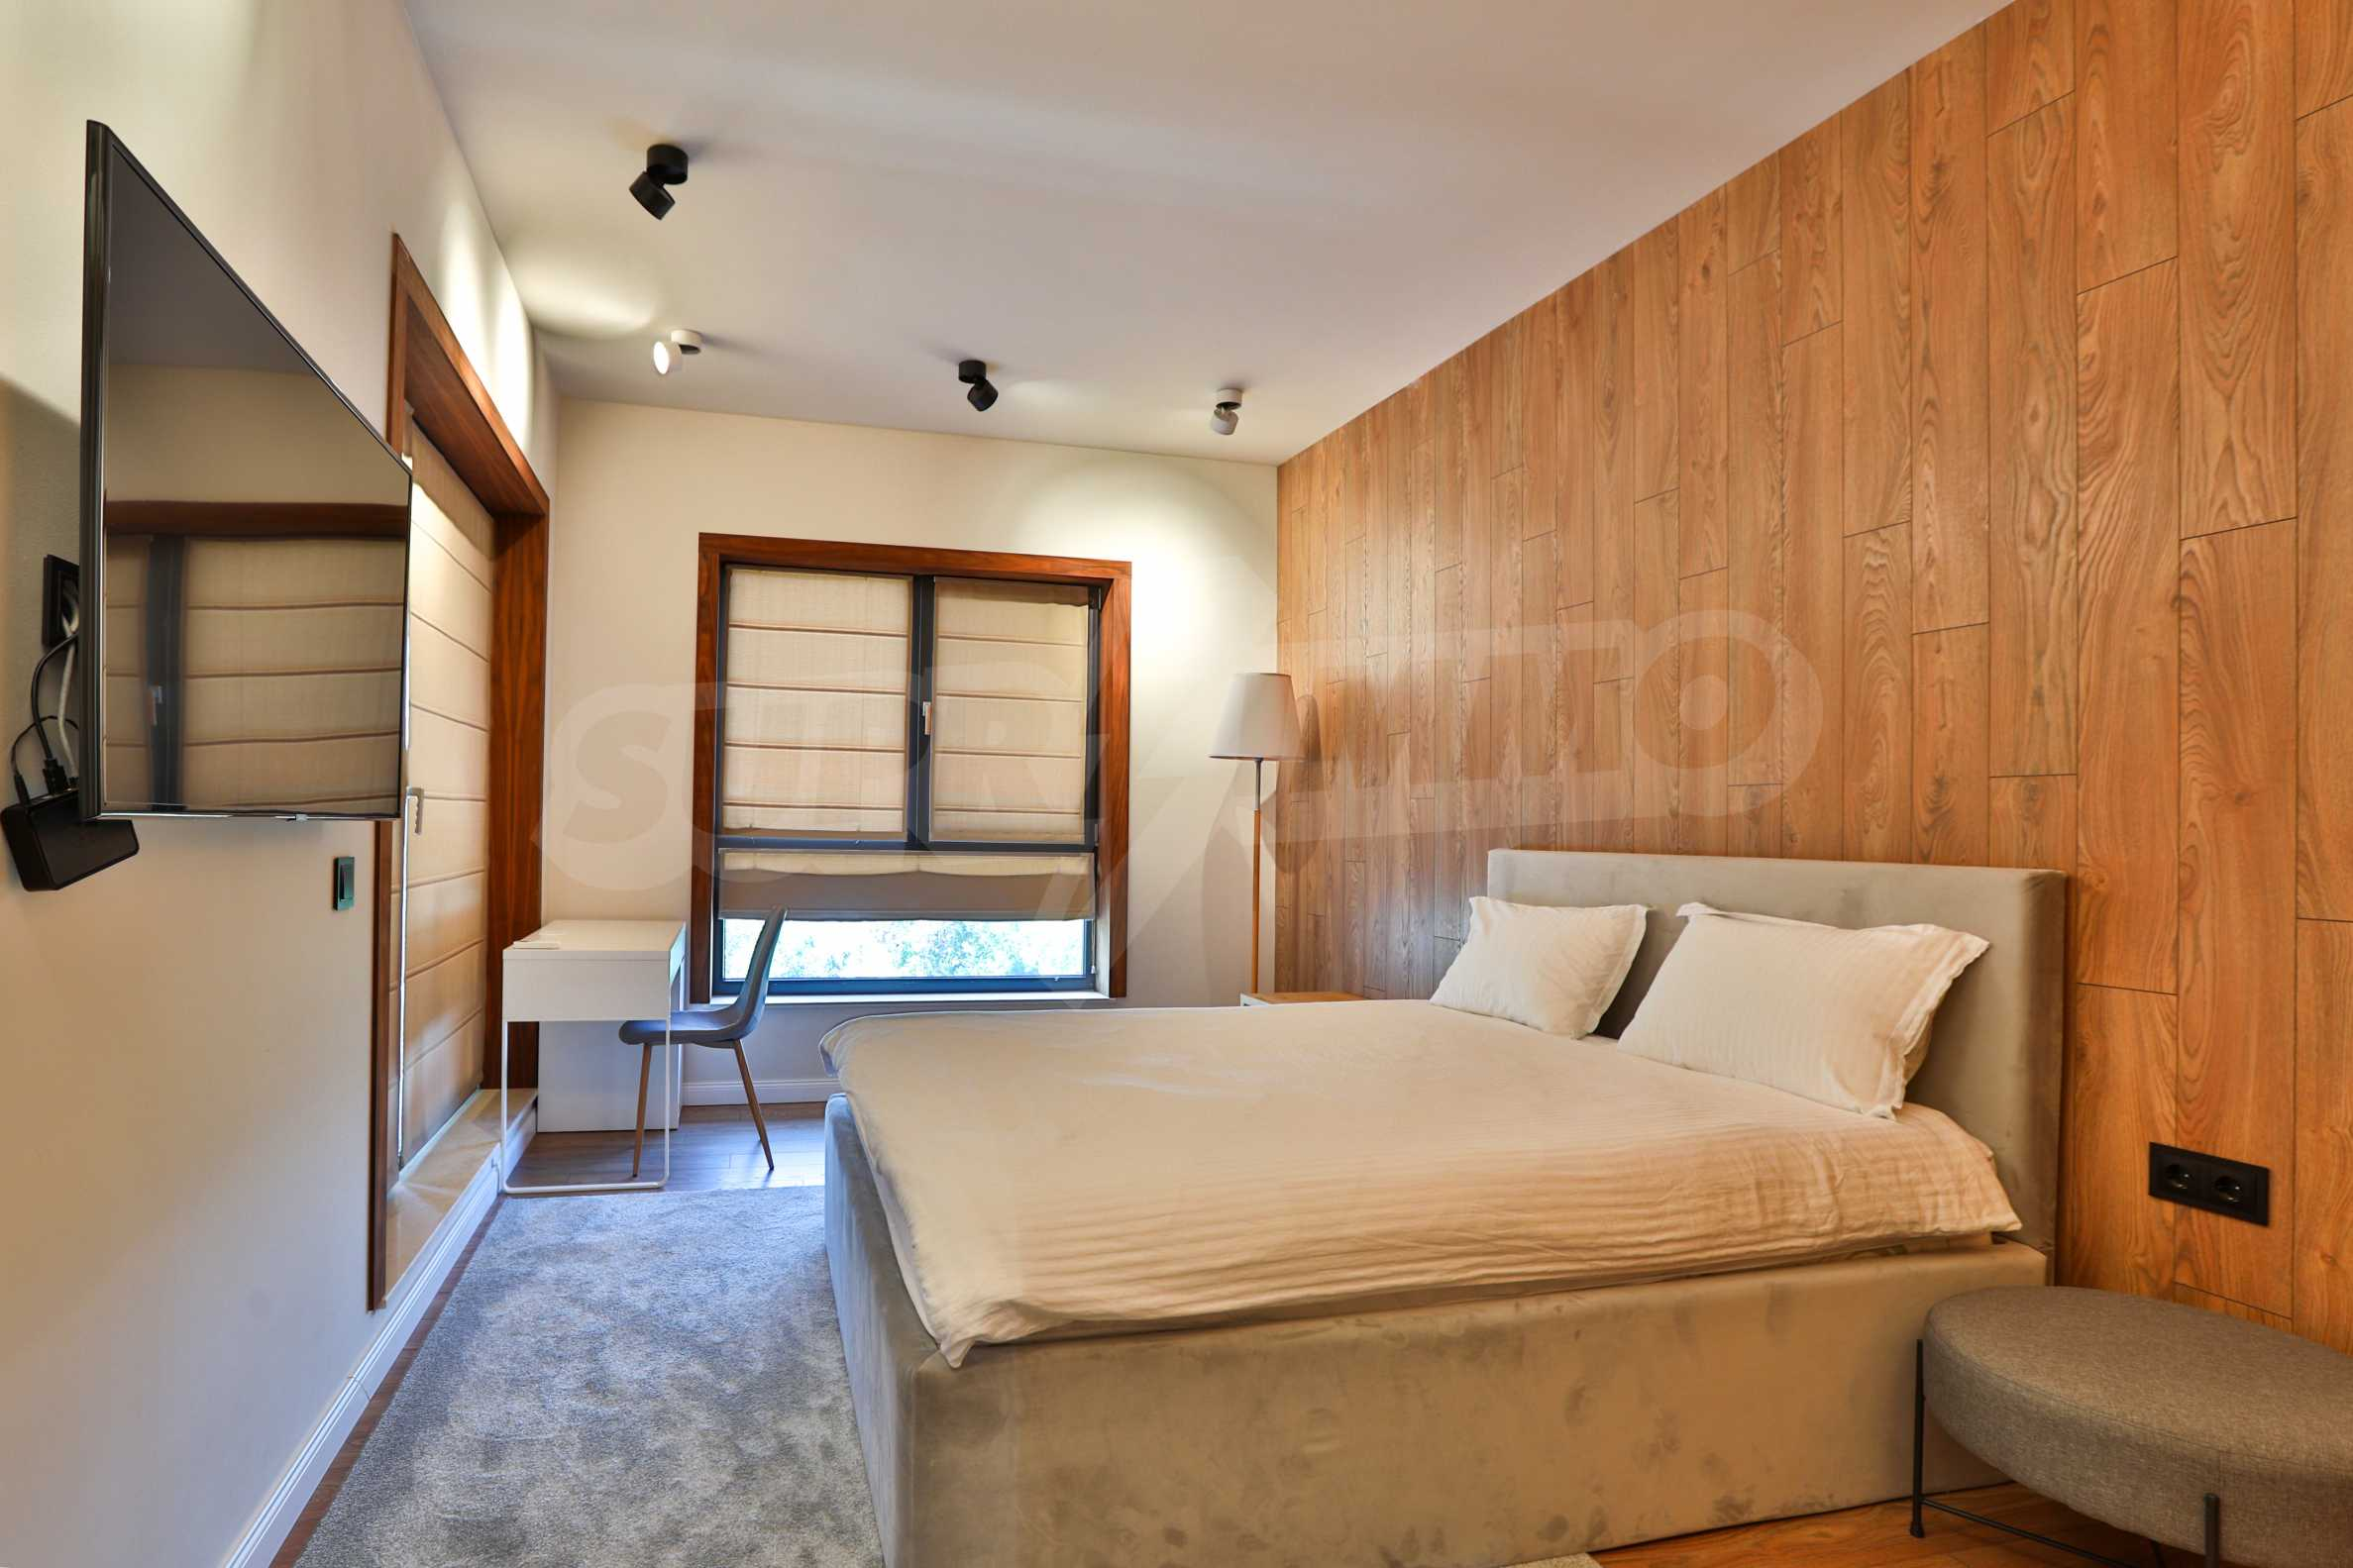 Дизайнерски обзаведен многостаен апартамент 12